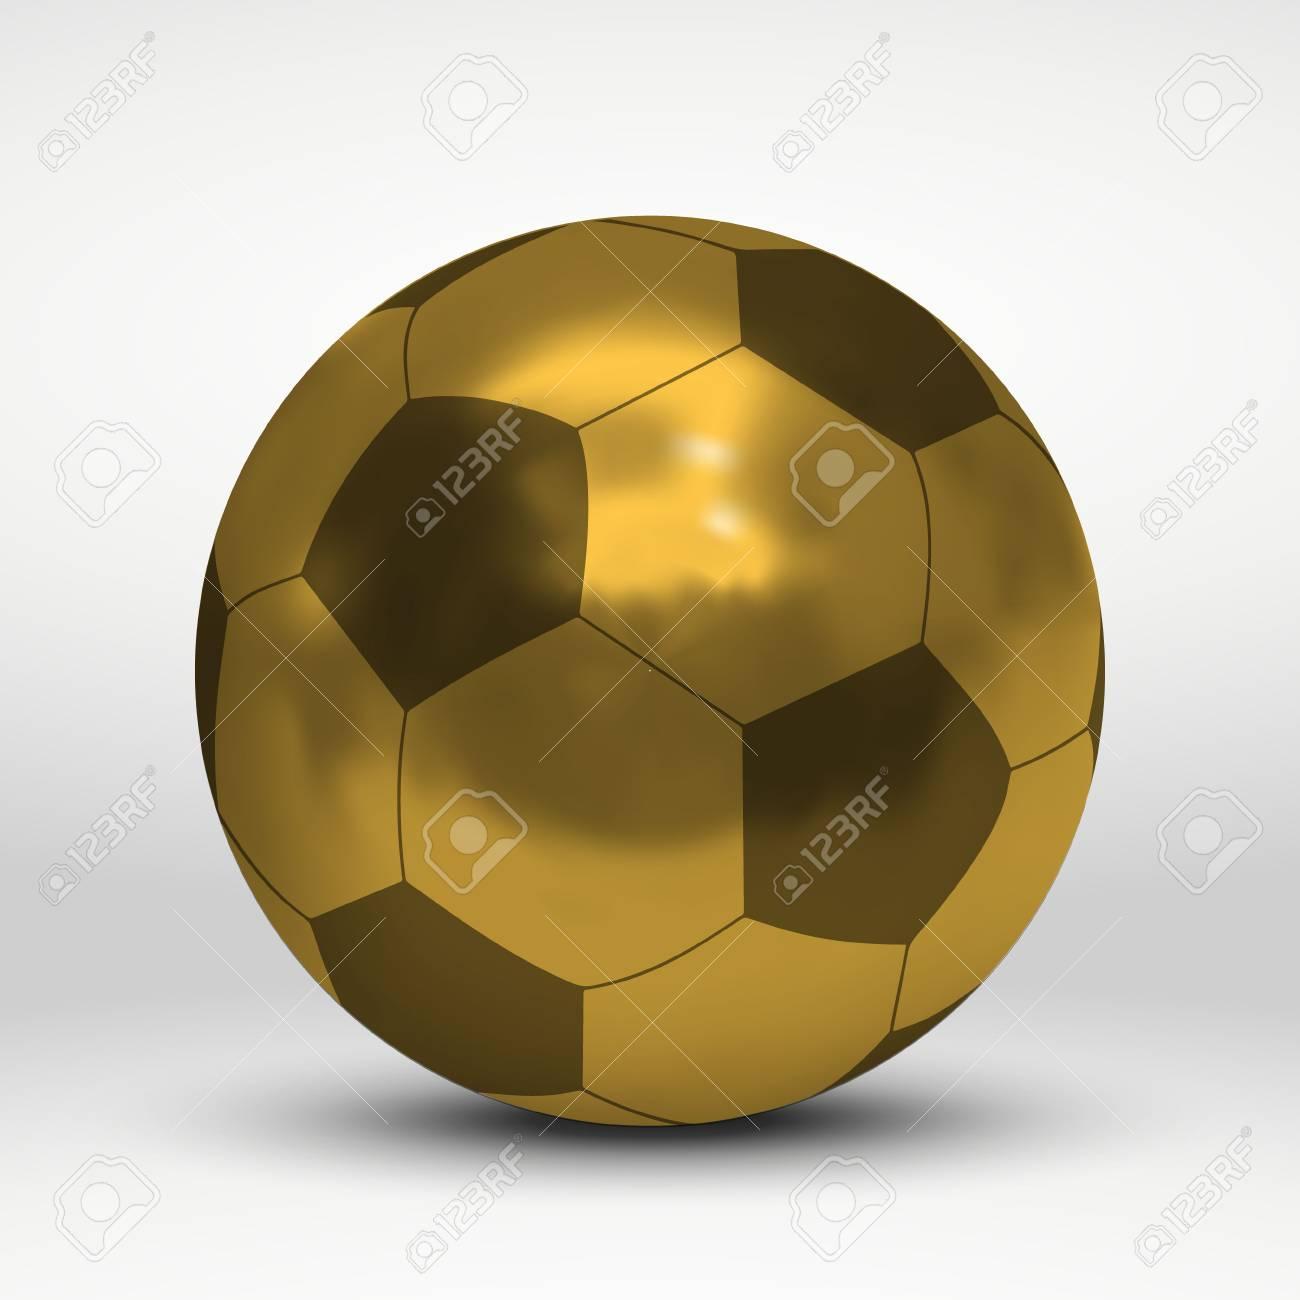 b1682b53d Vector - Vector illustration with golden soccer ball over white background